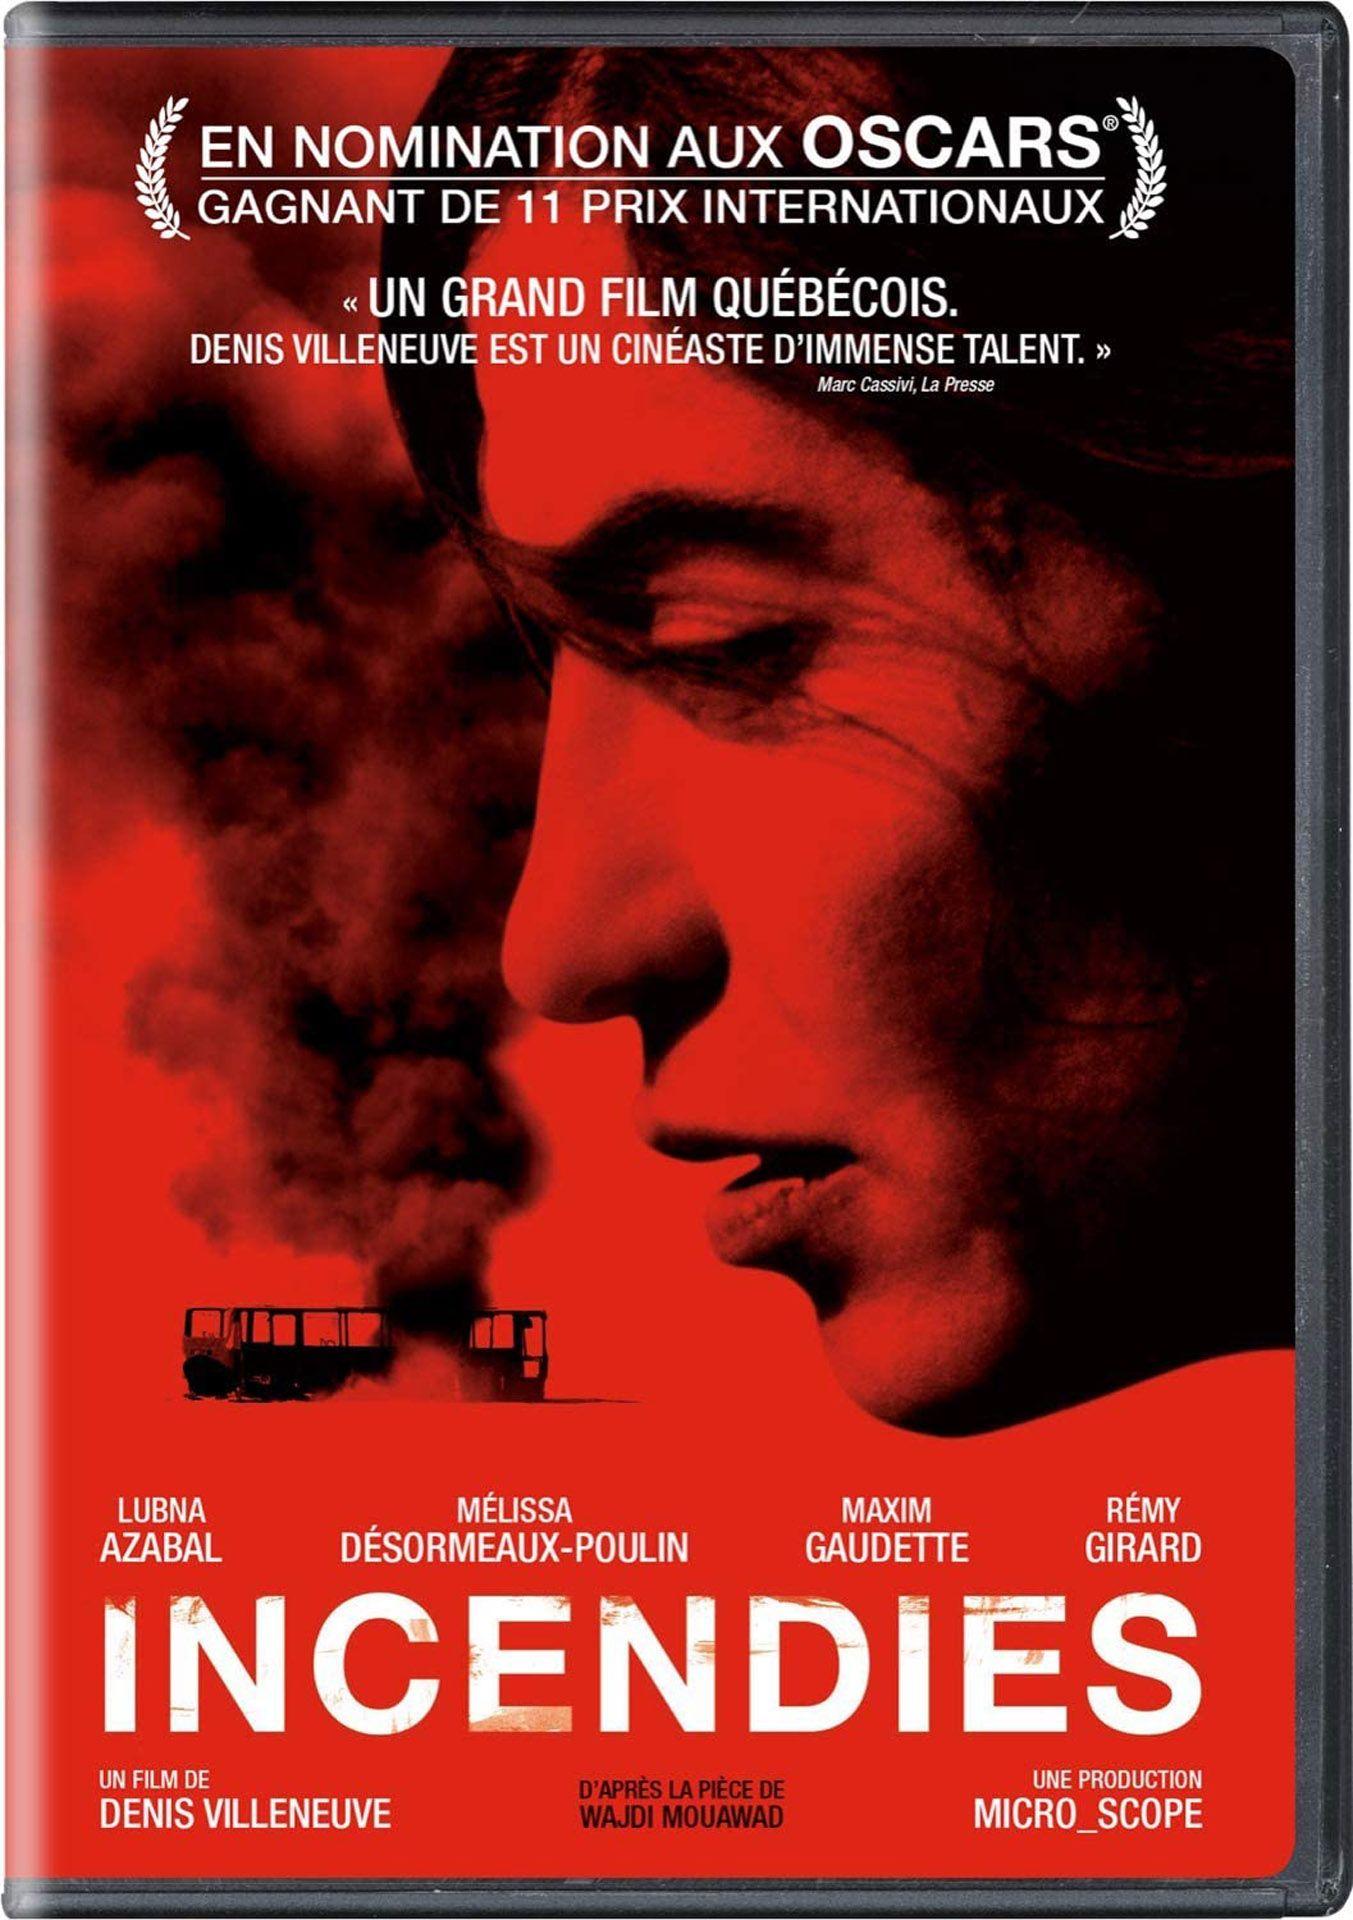 poster of Incendies movie by Denis Villeneuve